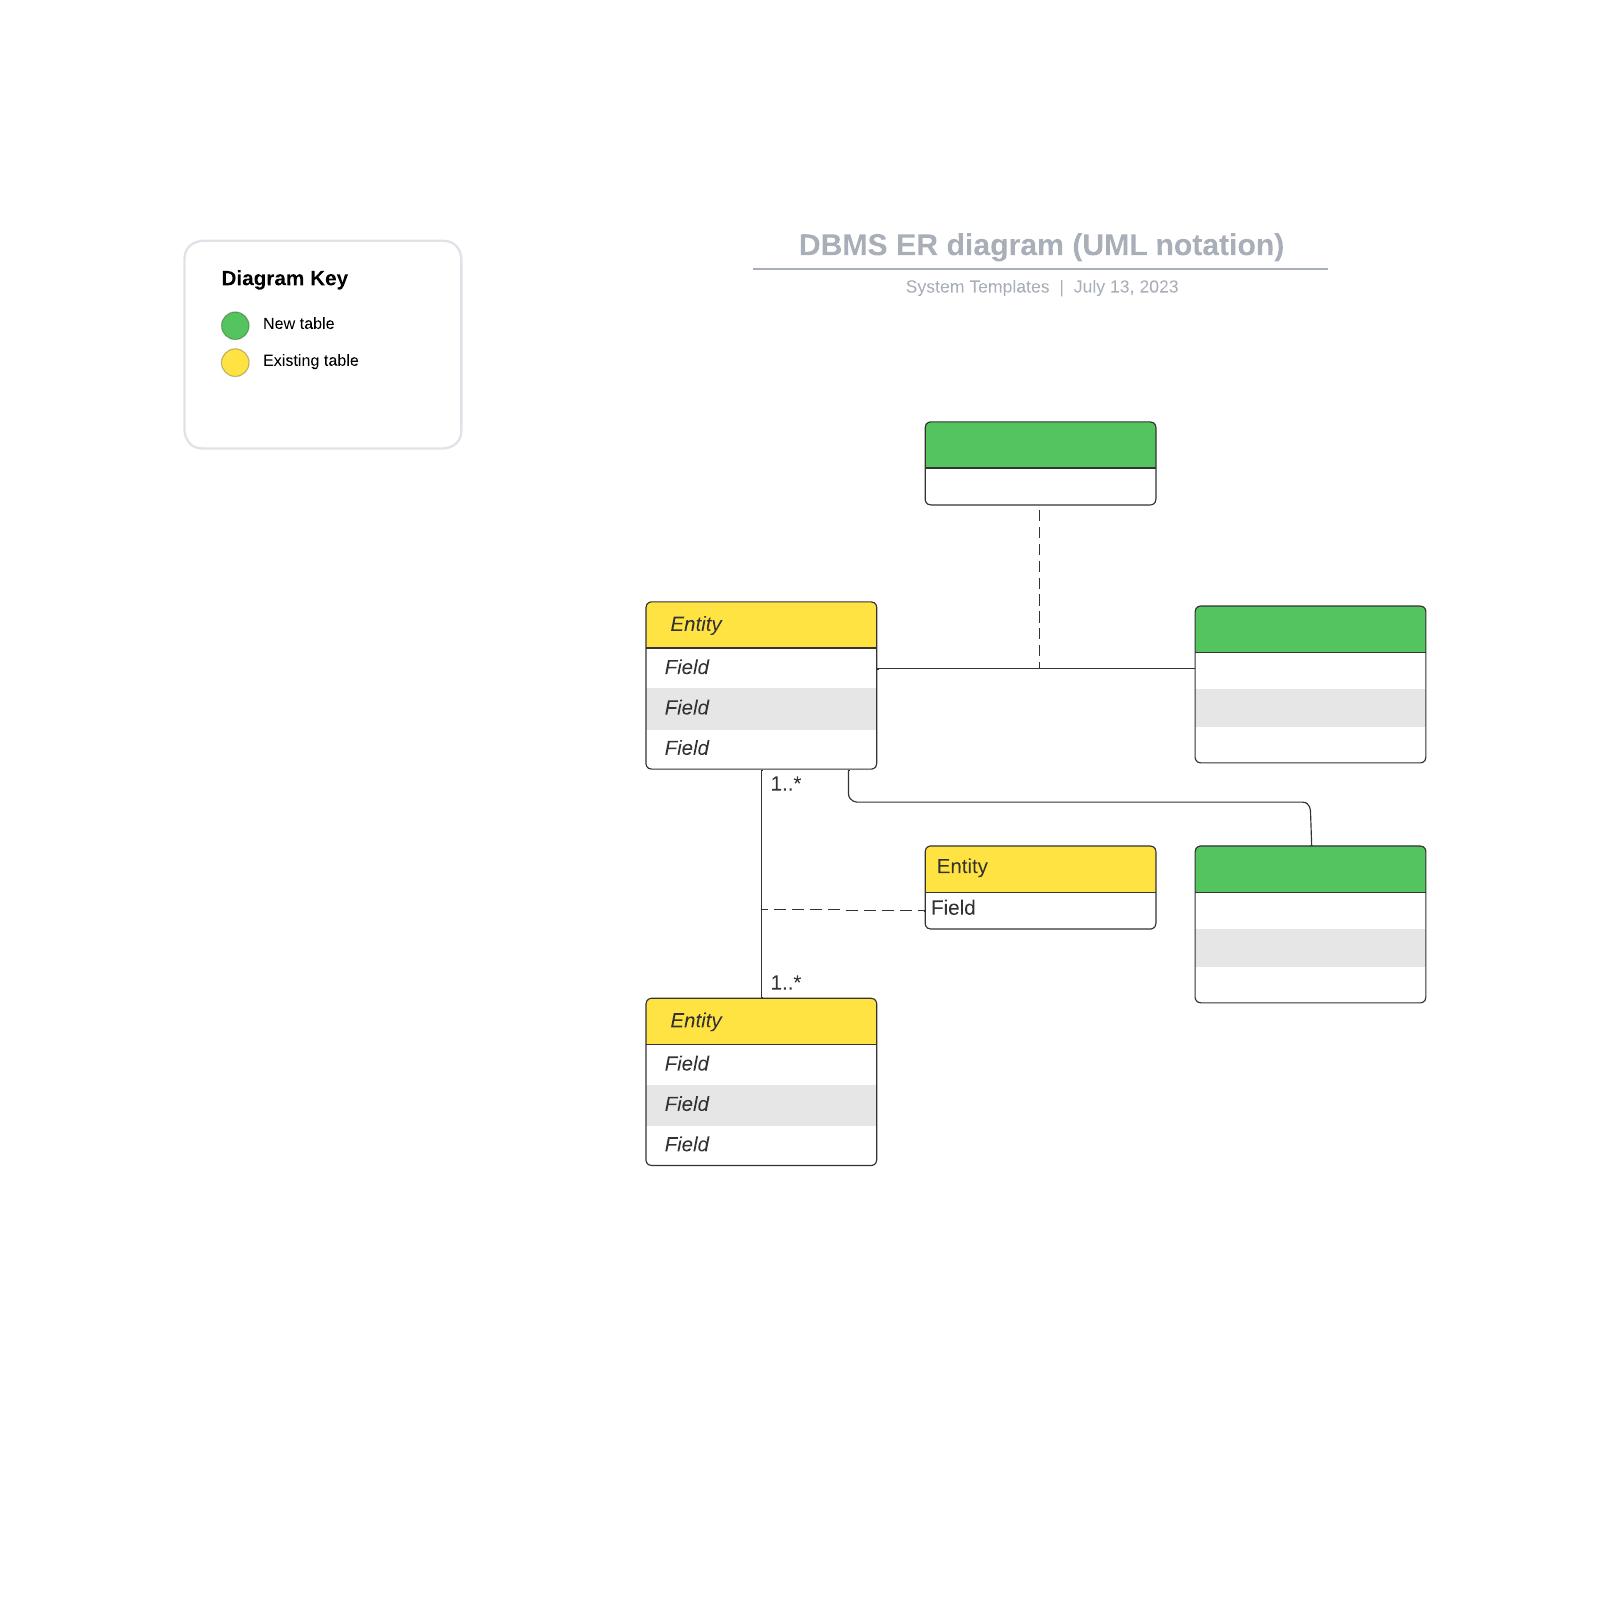 DBMS ER diagram (UML notation)